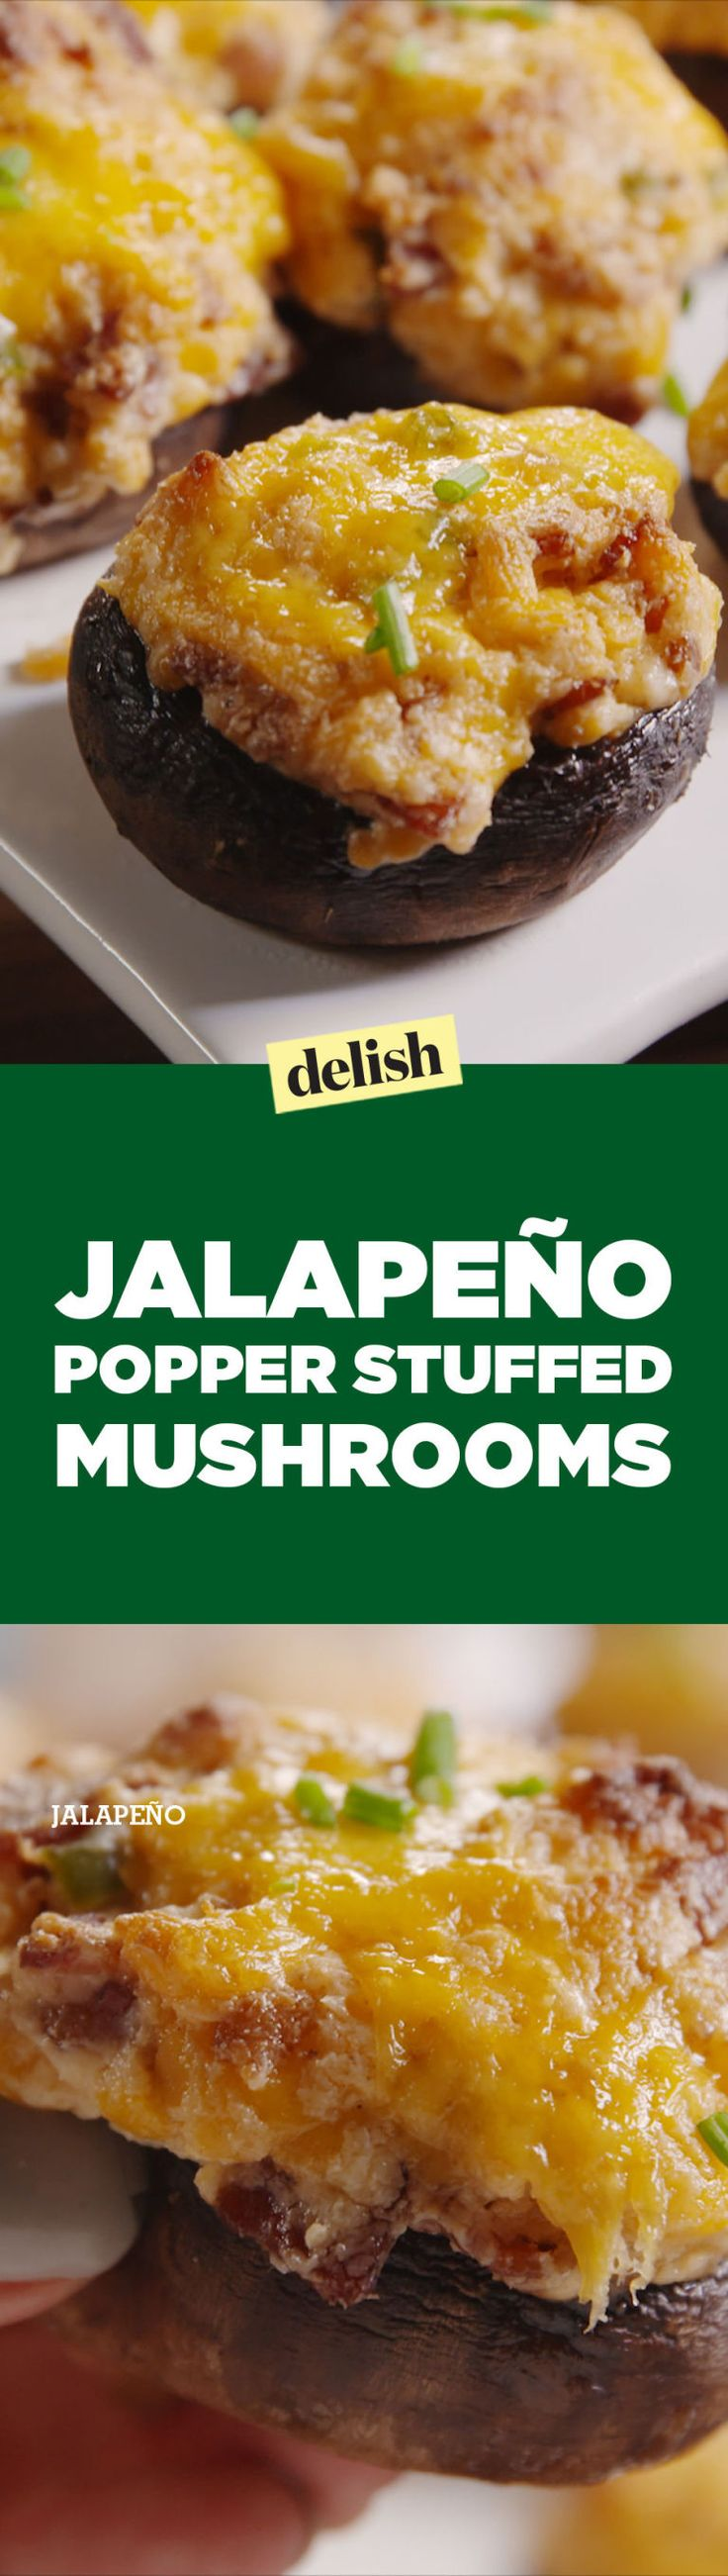 Jalapeño Popper Stuffed Mushrooms  - Delish.com